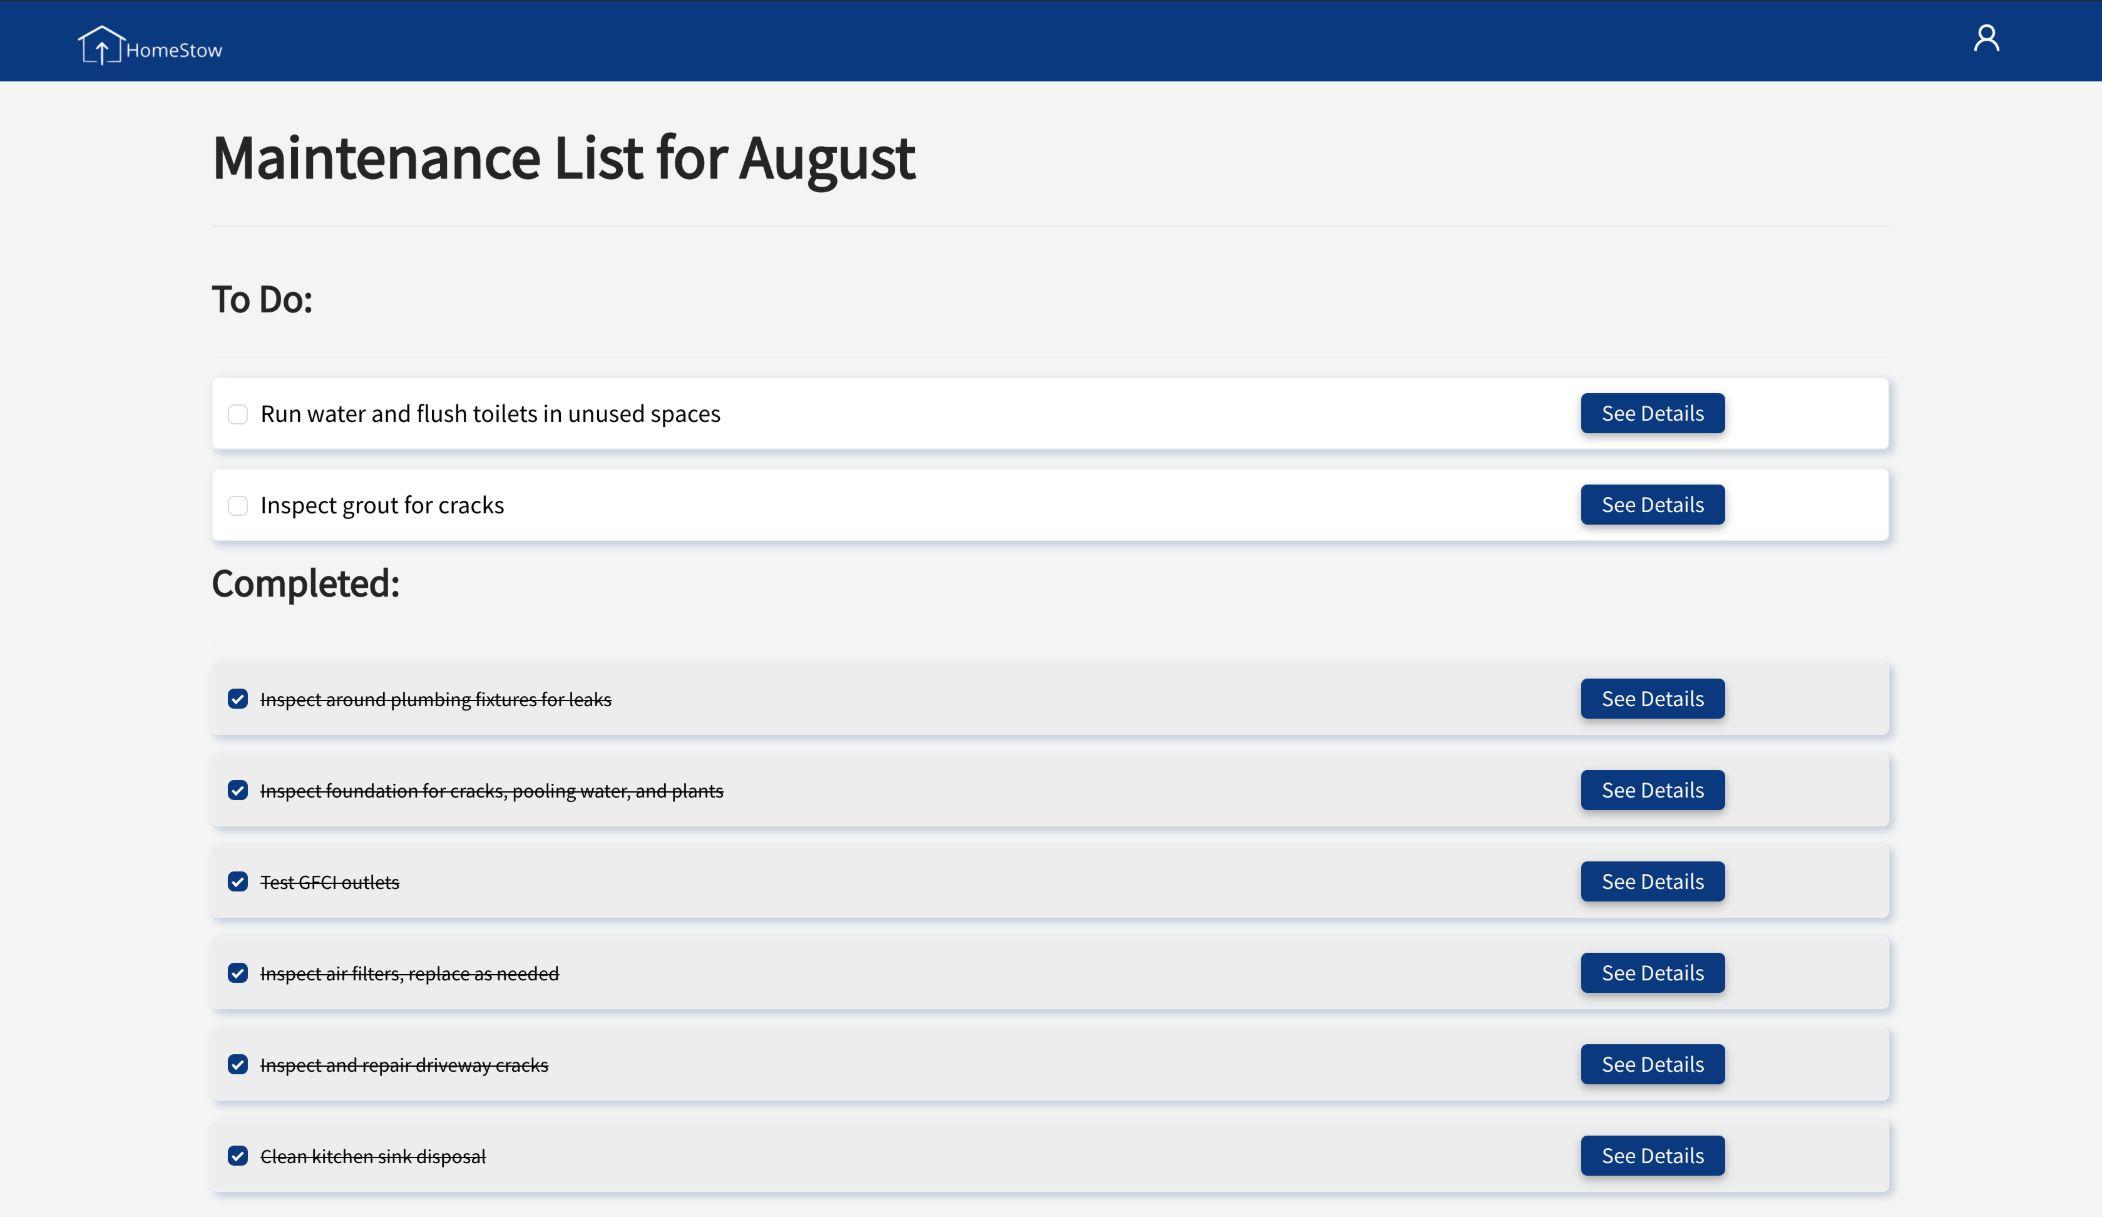 HomeStow maintenance list